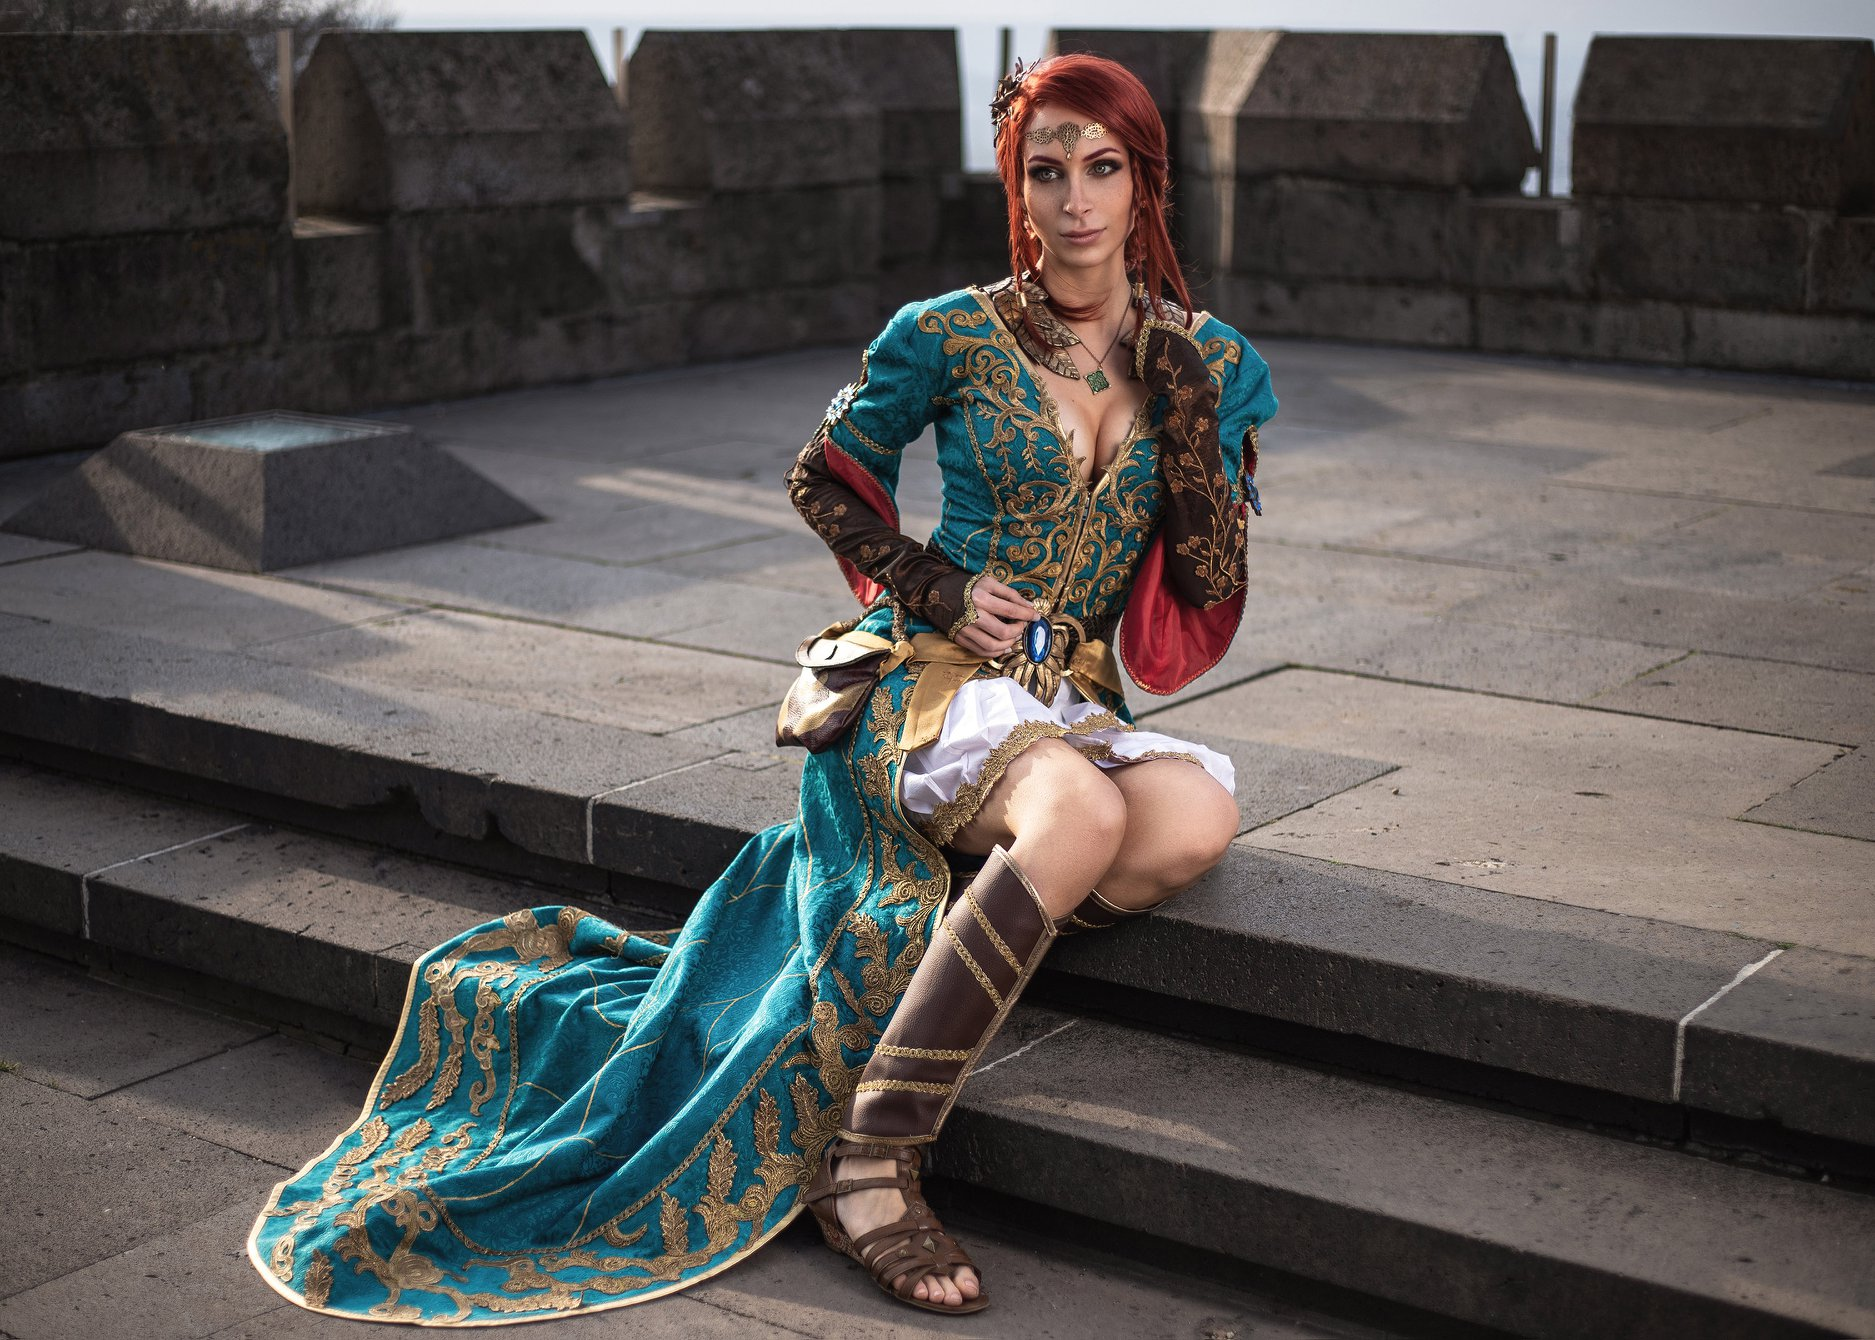 Lena-Lara jako Triss Merigold